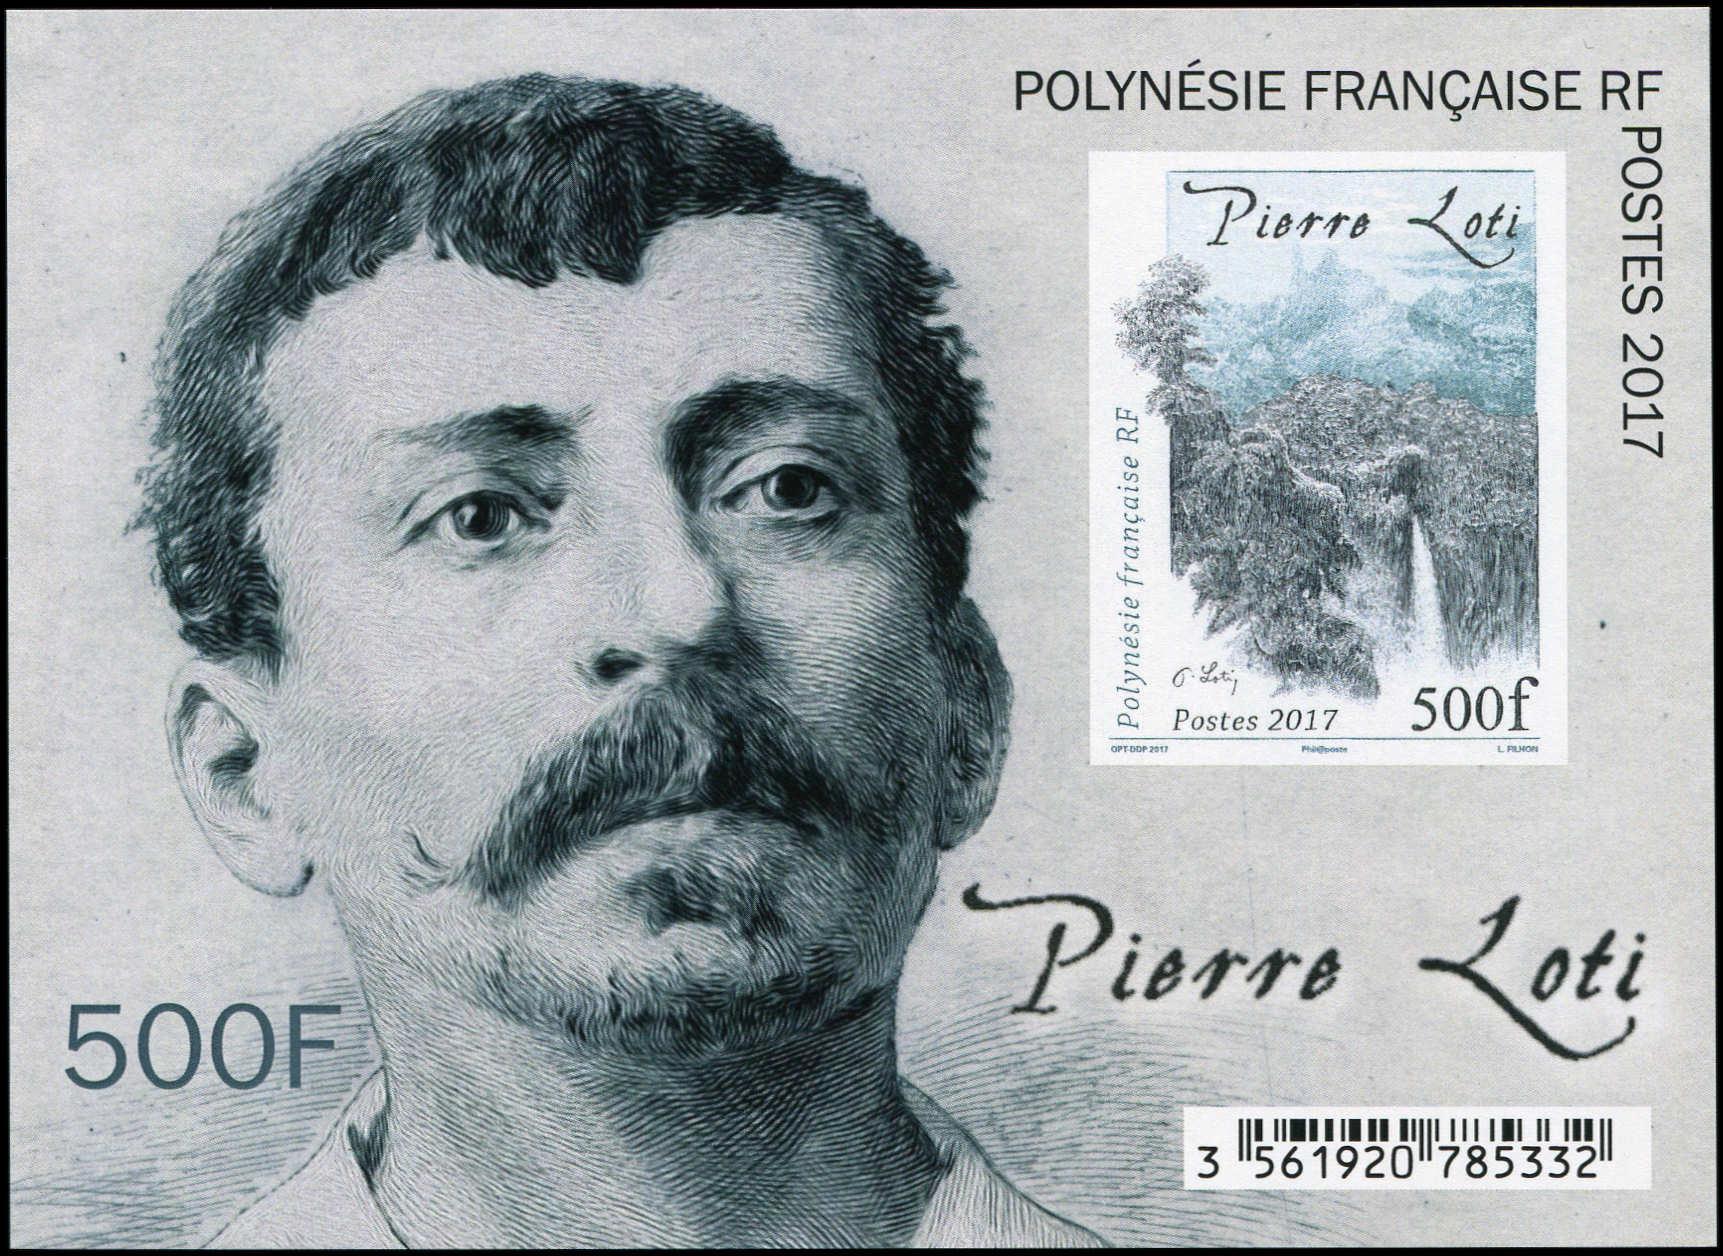 Loti timbre 2017 500 F Polynésie française.